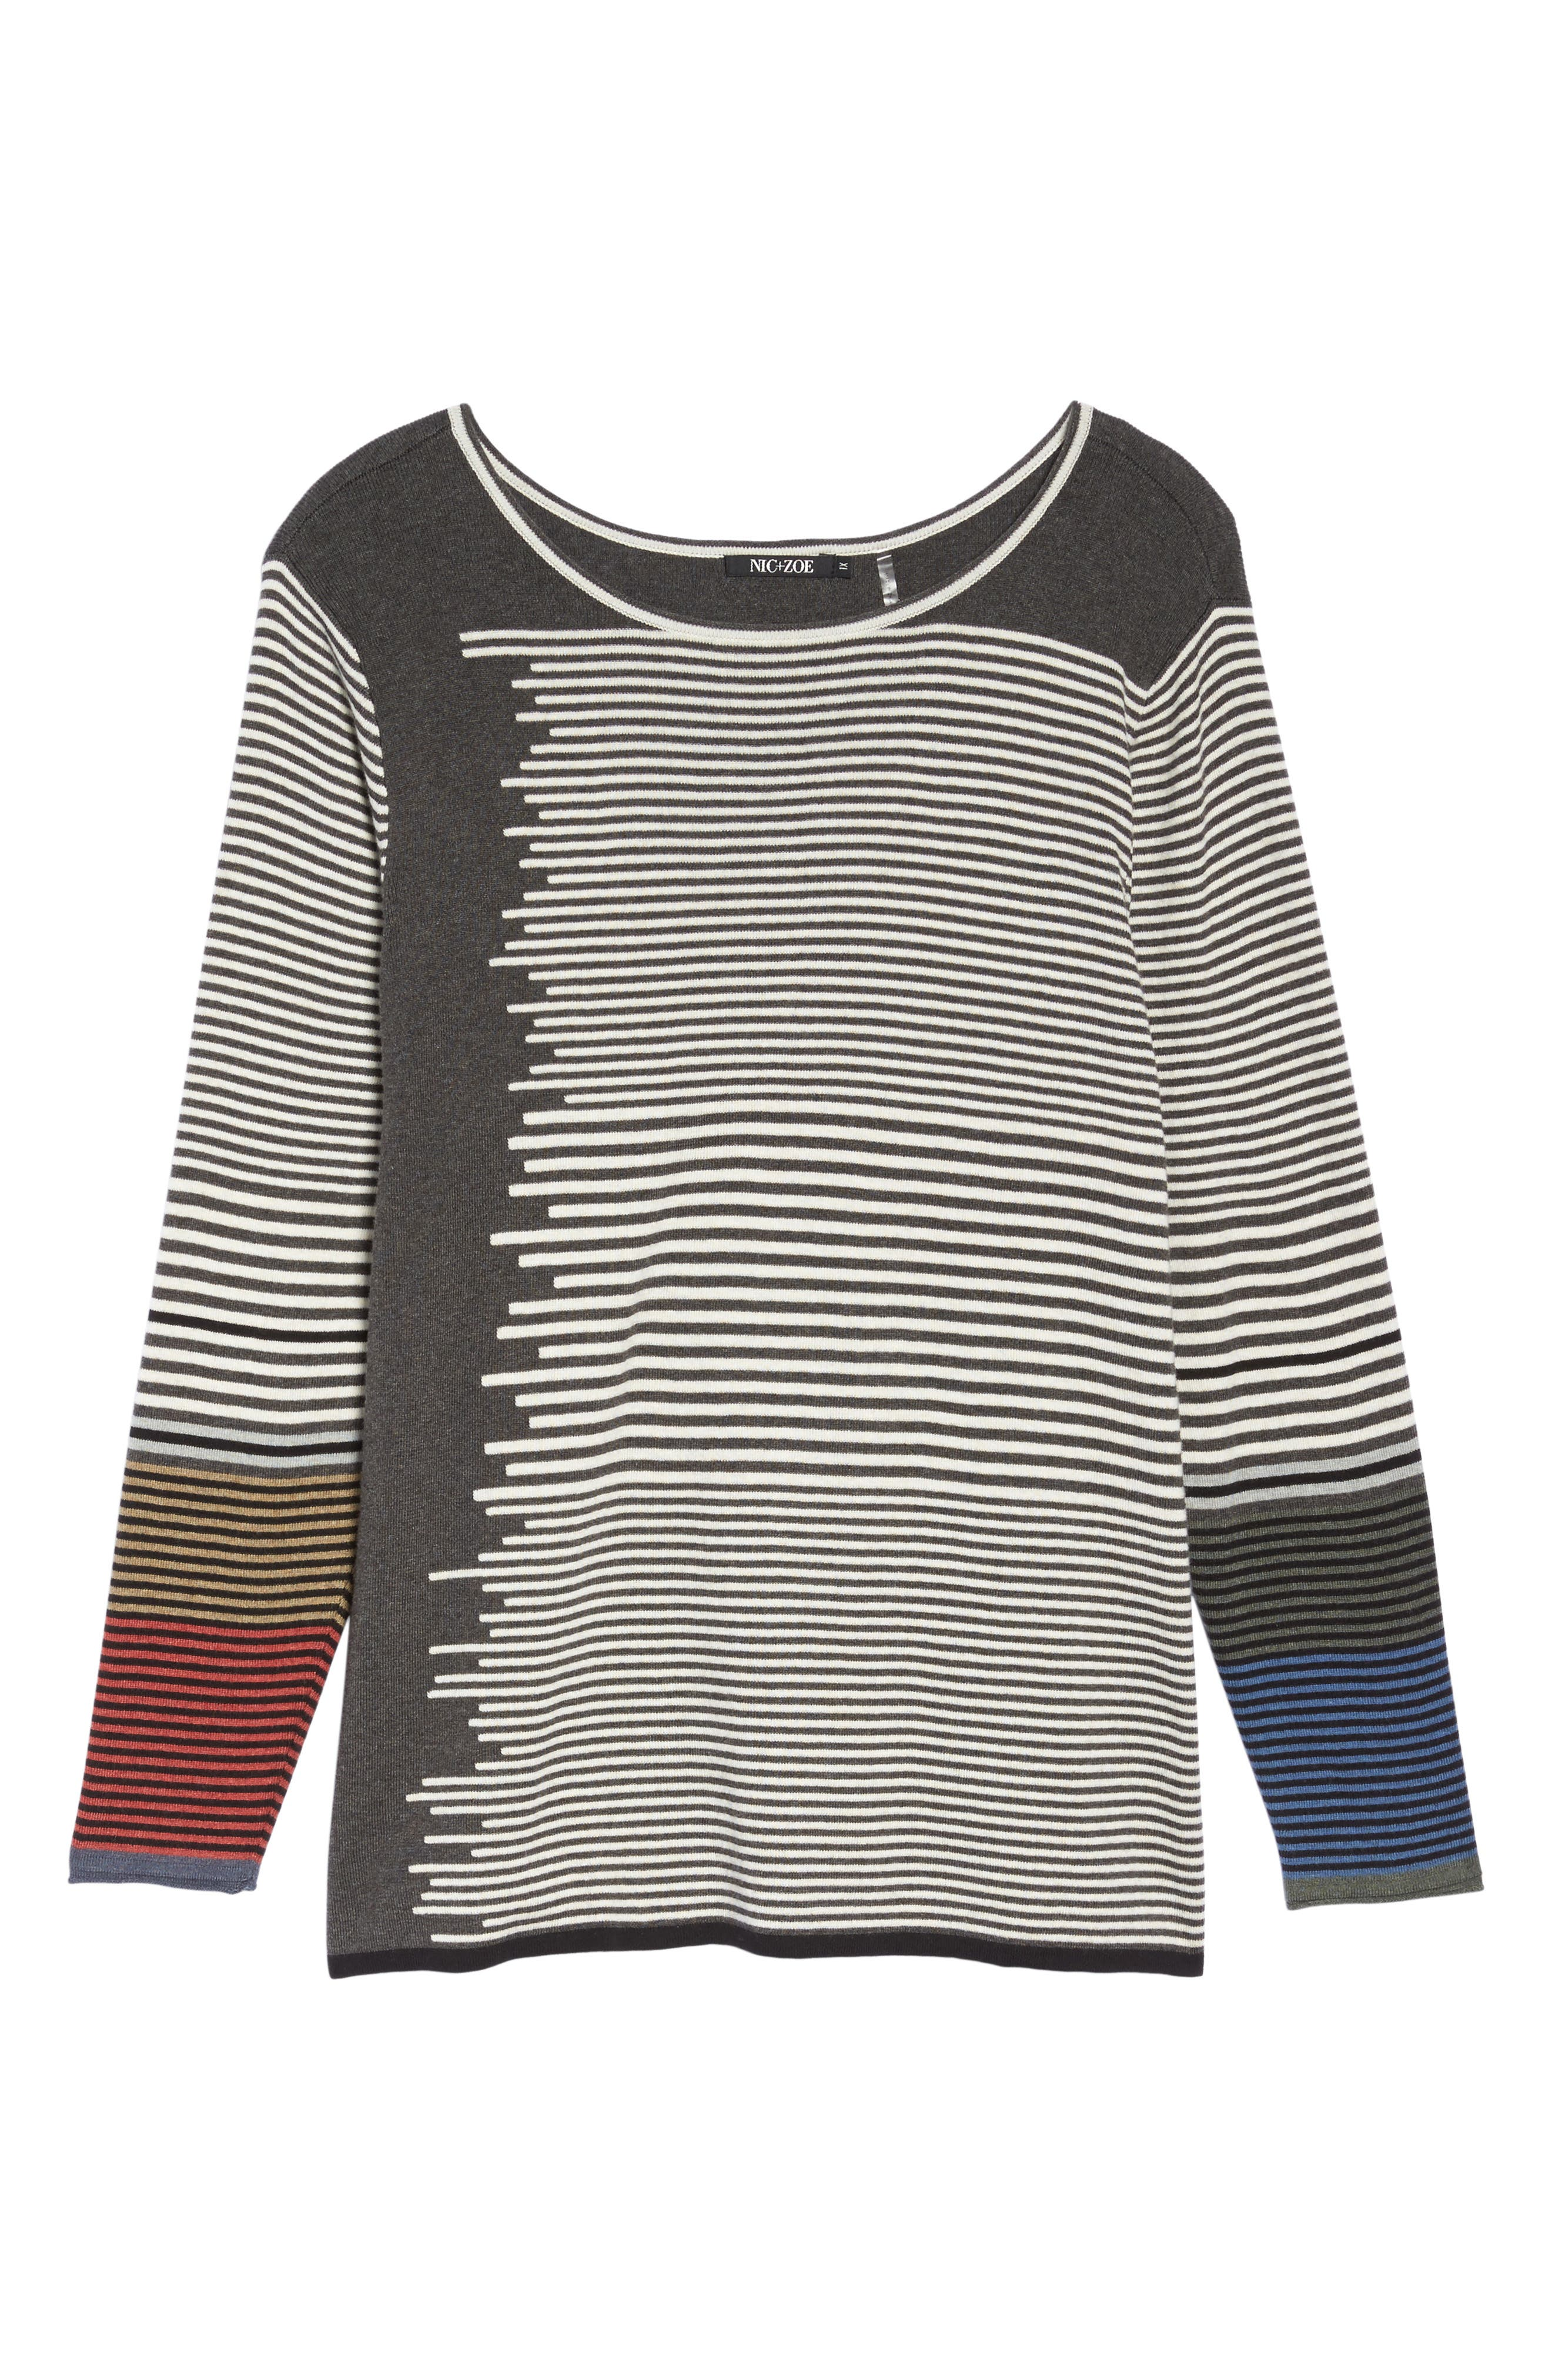 Metro Stripe Sweater,                             Alternate thumbnail 6, color,                             020